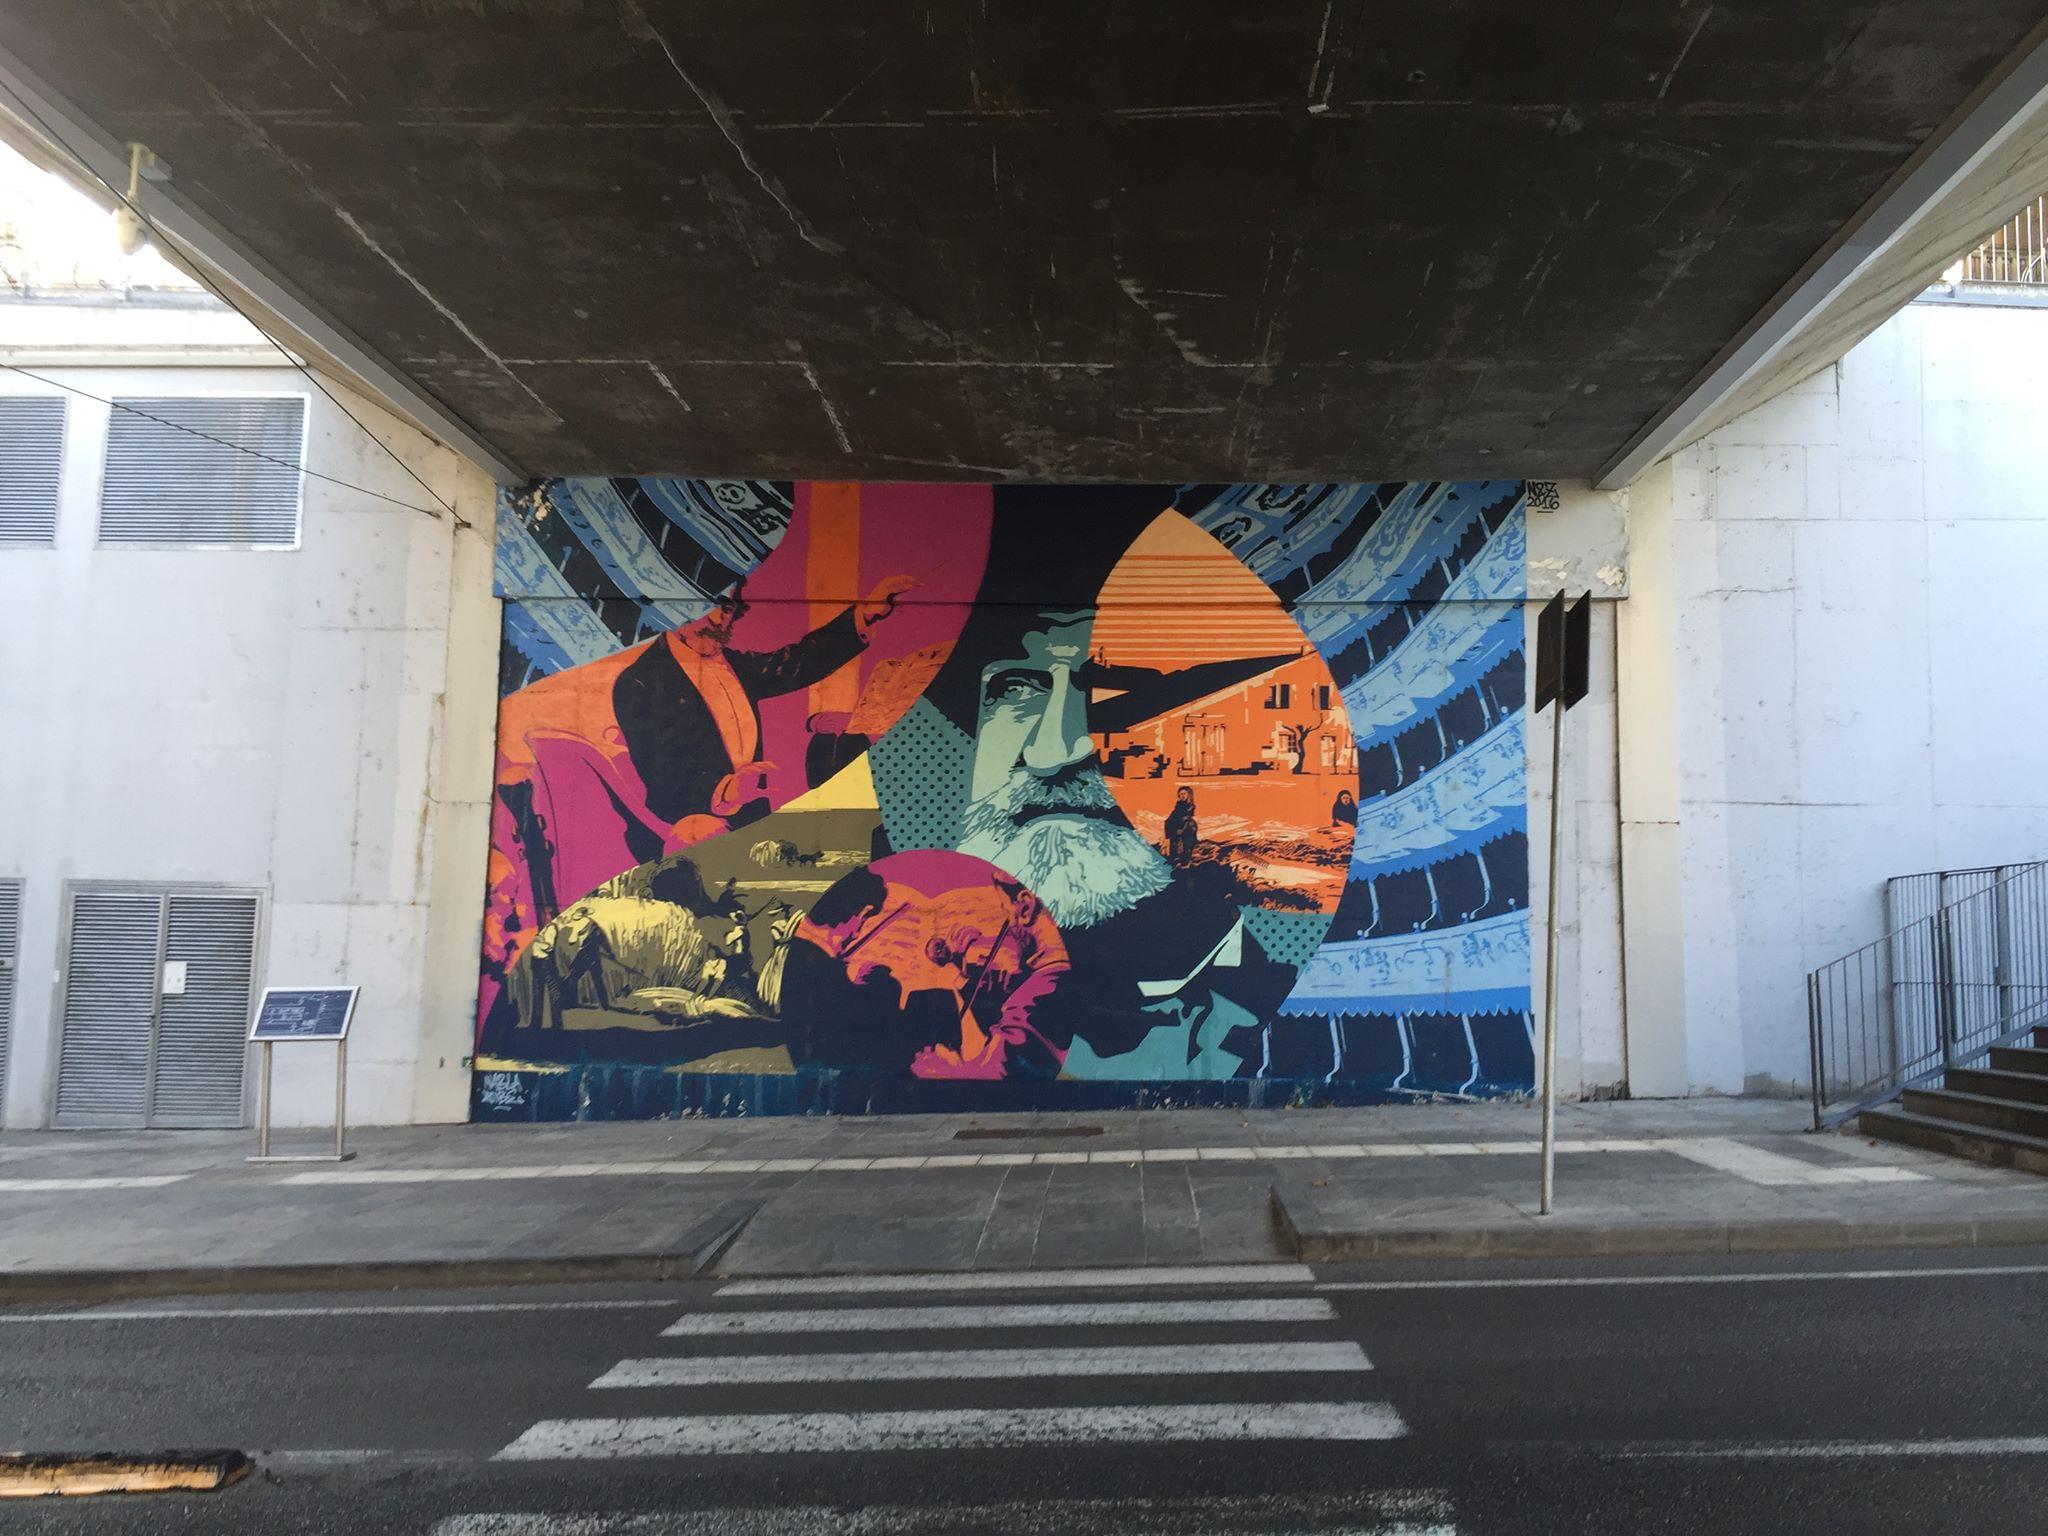 STREET VIEW : les fresques murales - MONDE (hors France) - Page 25 69640810